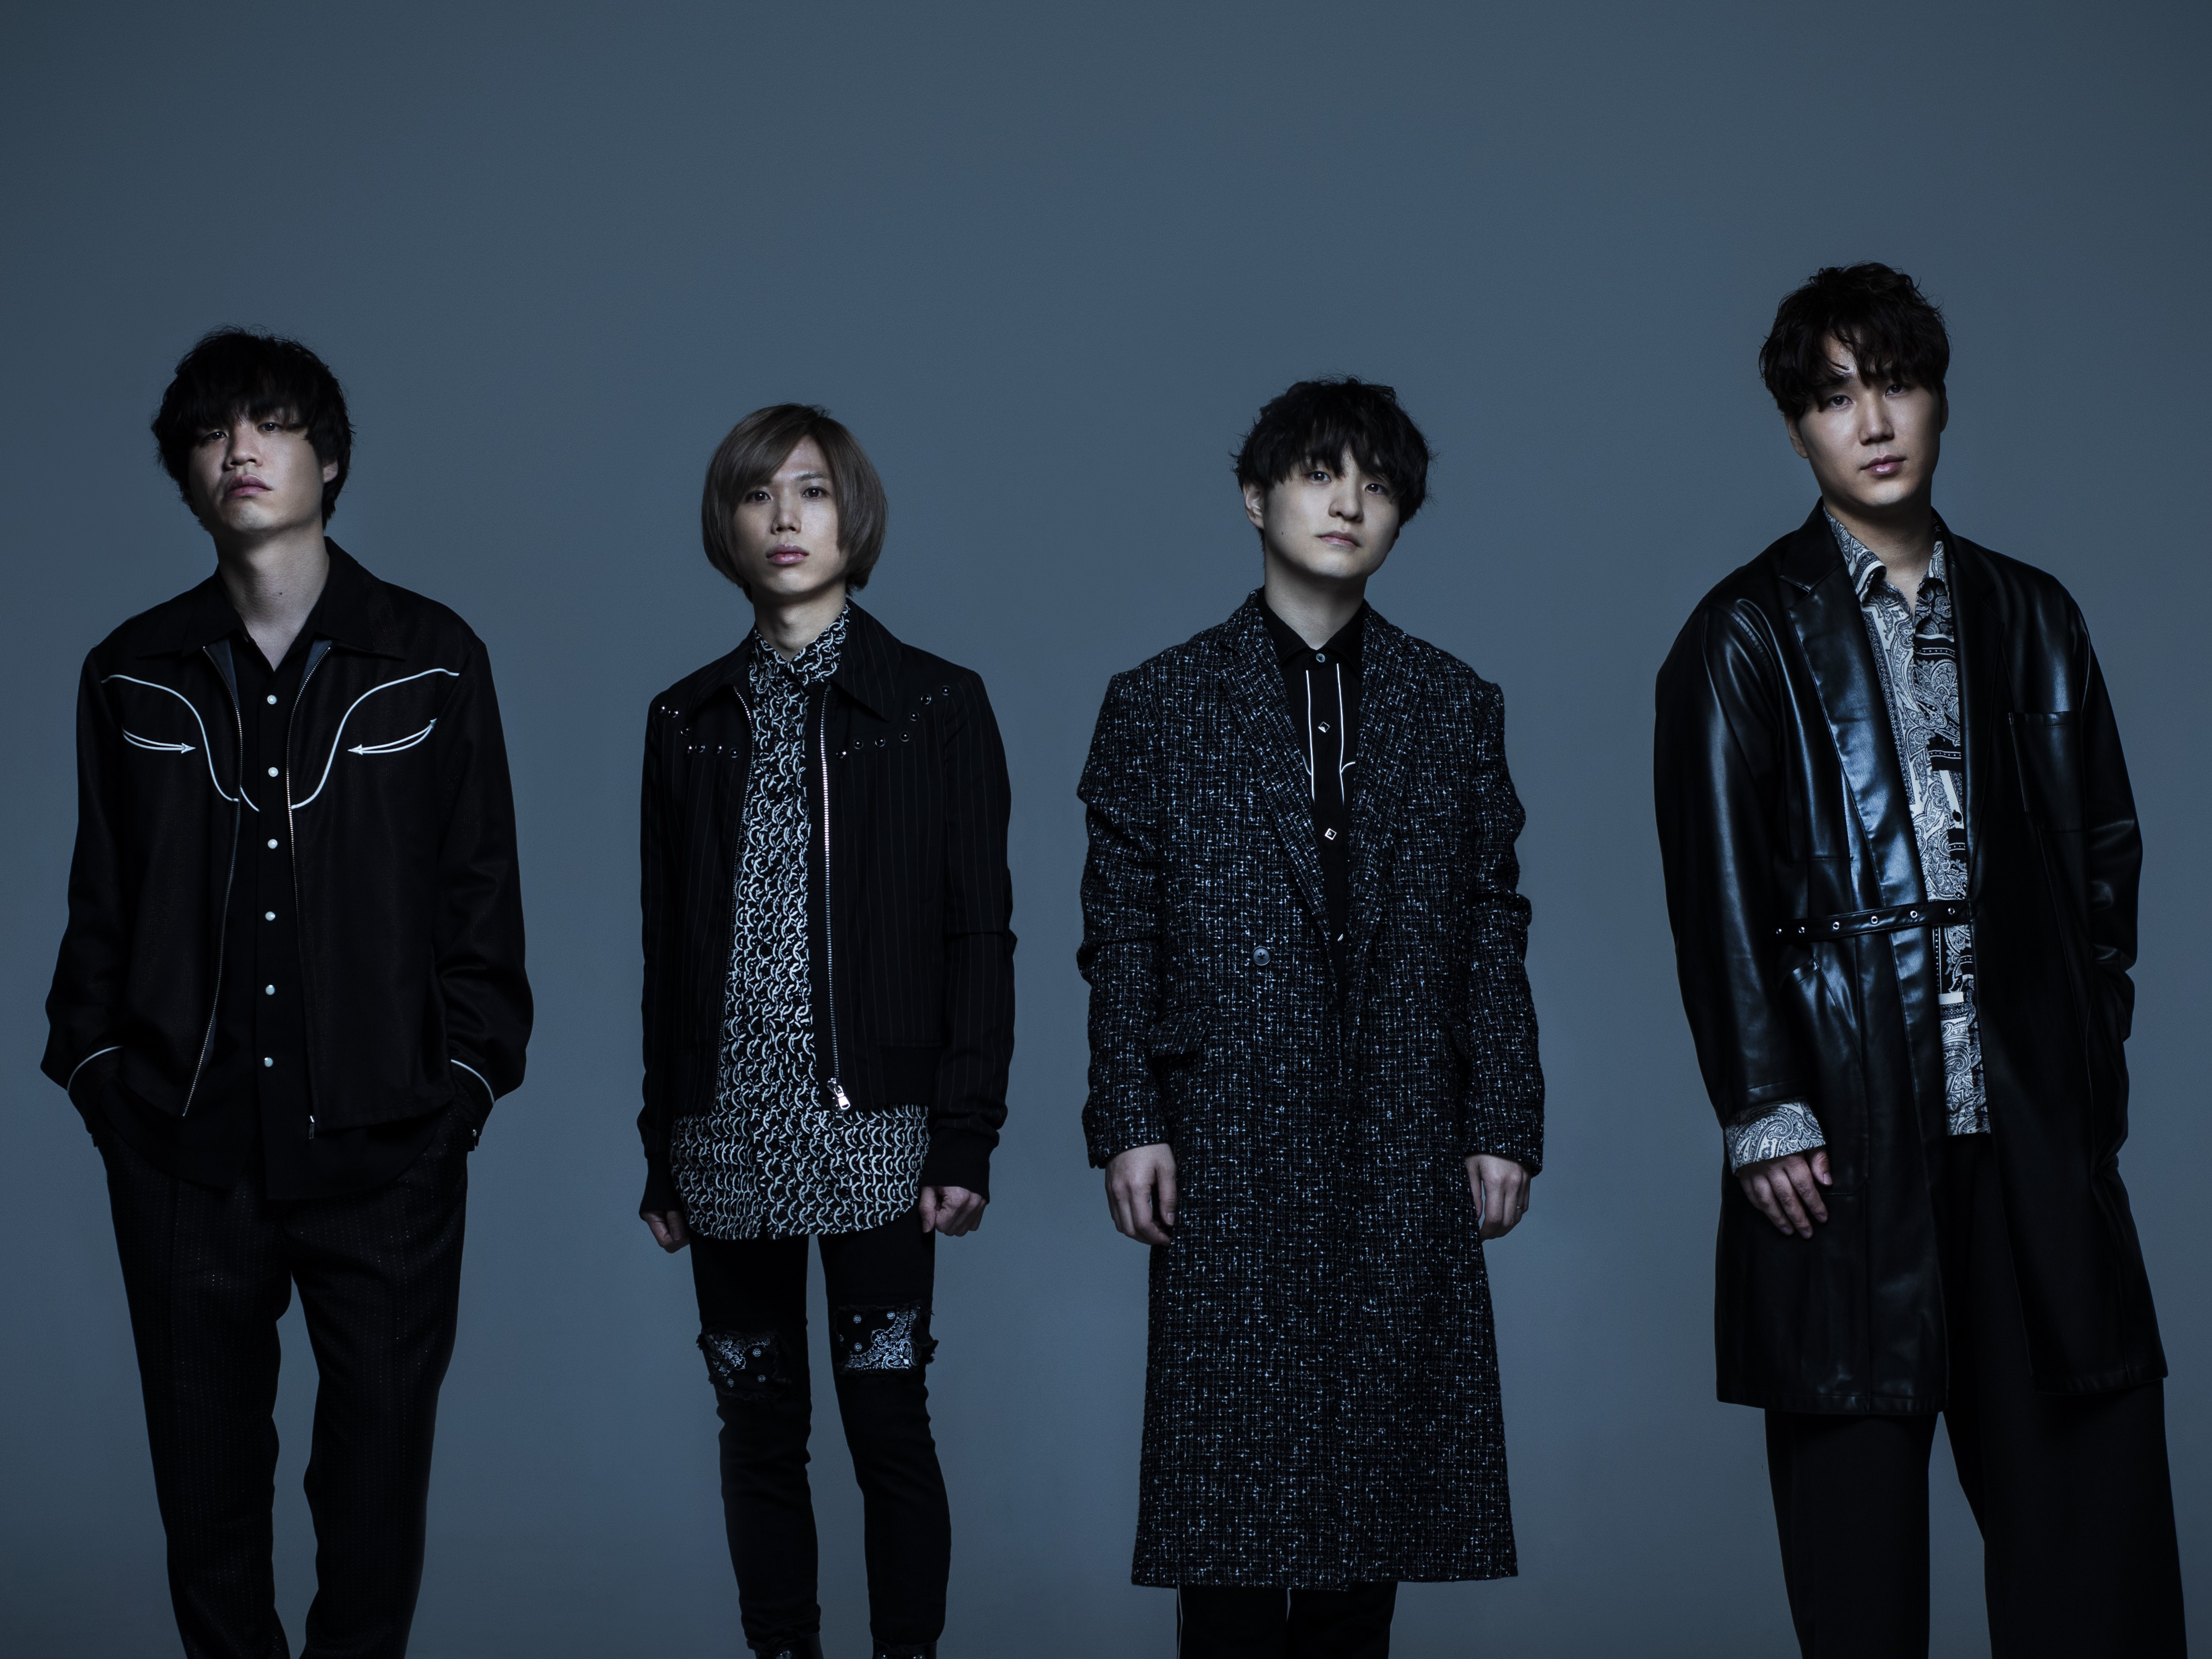 Laughter official dism 男 lyrics 髭